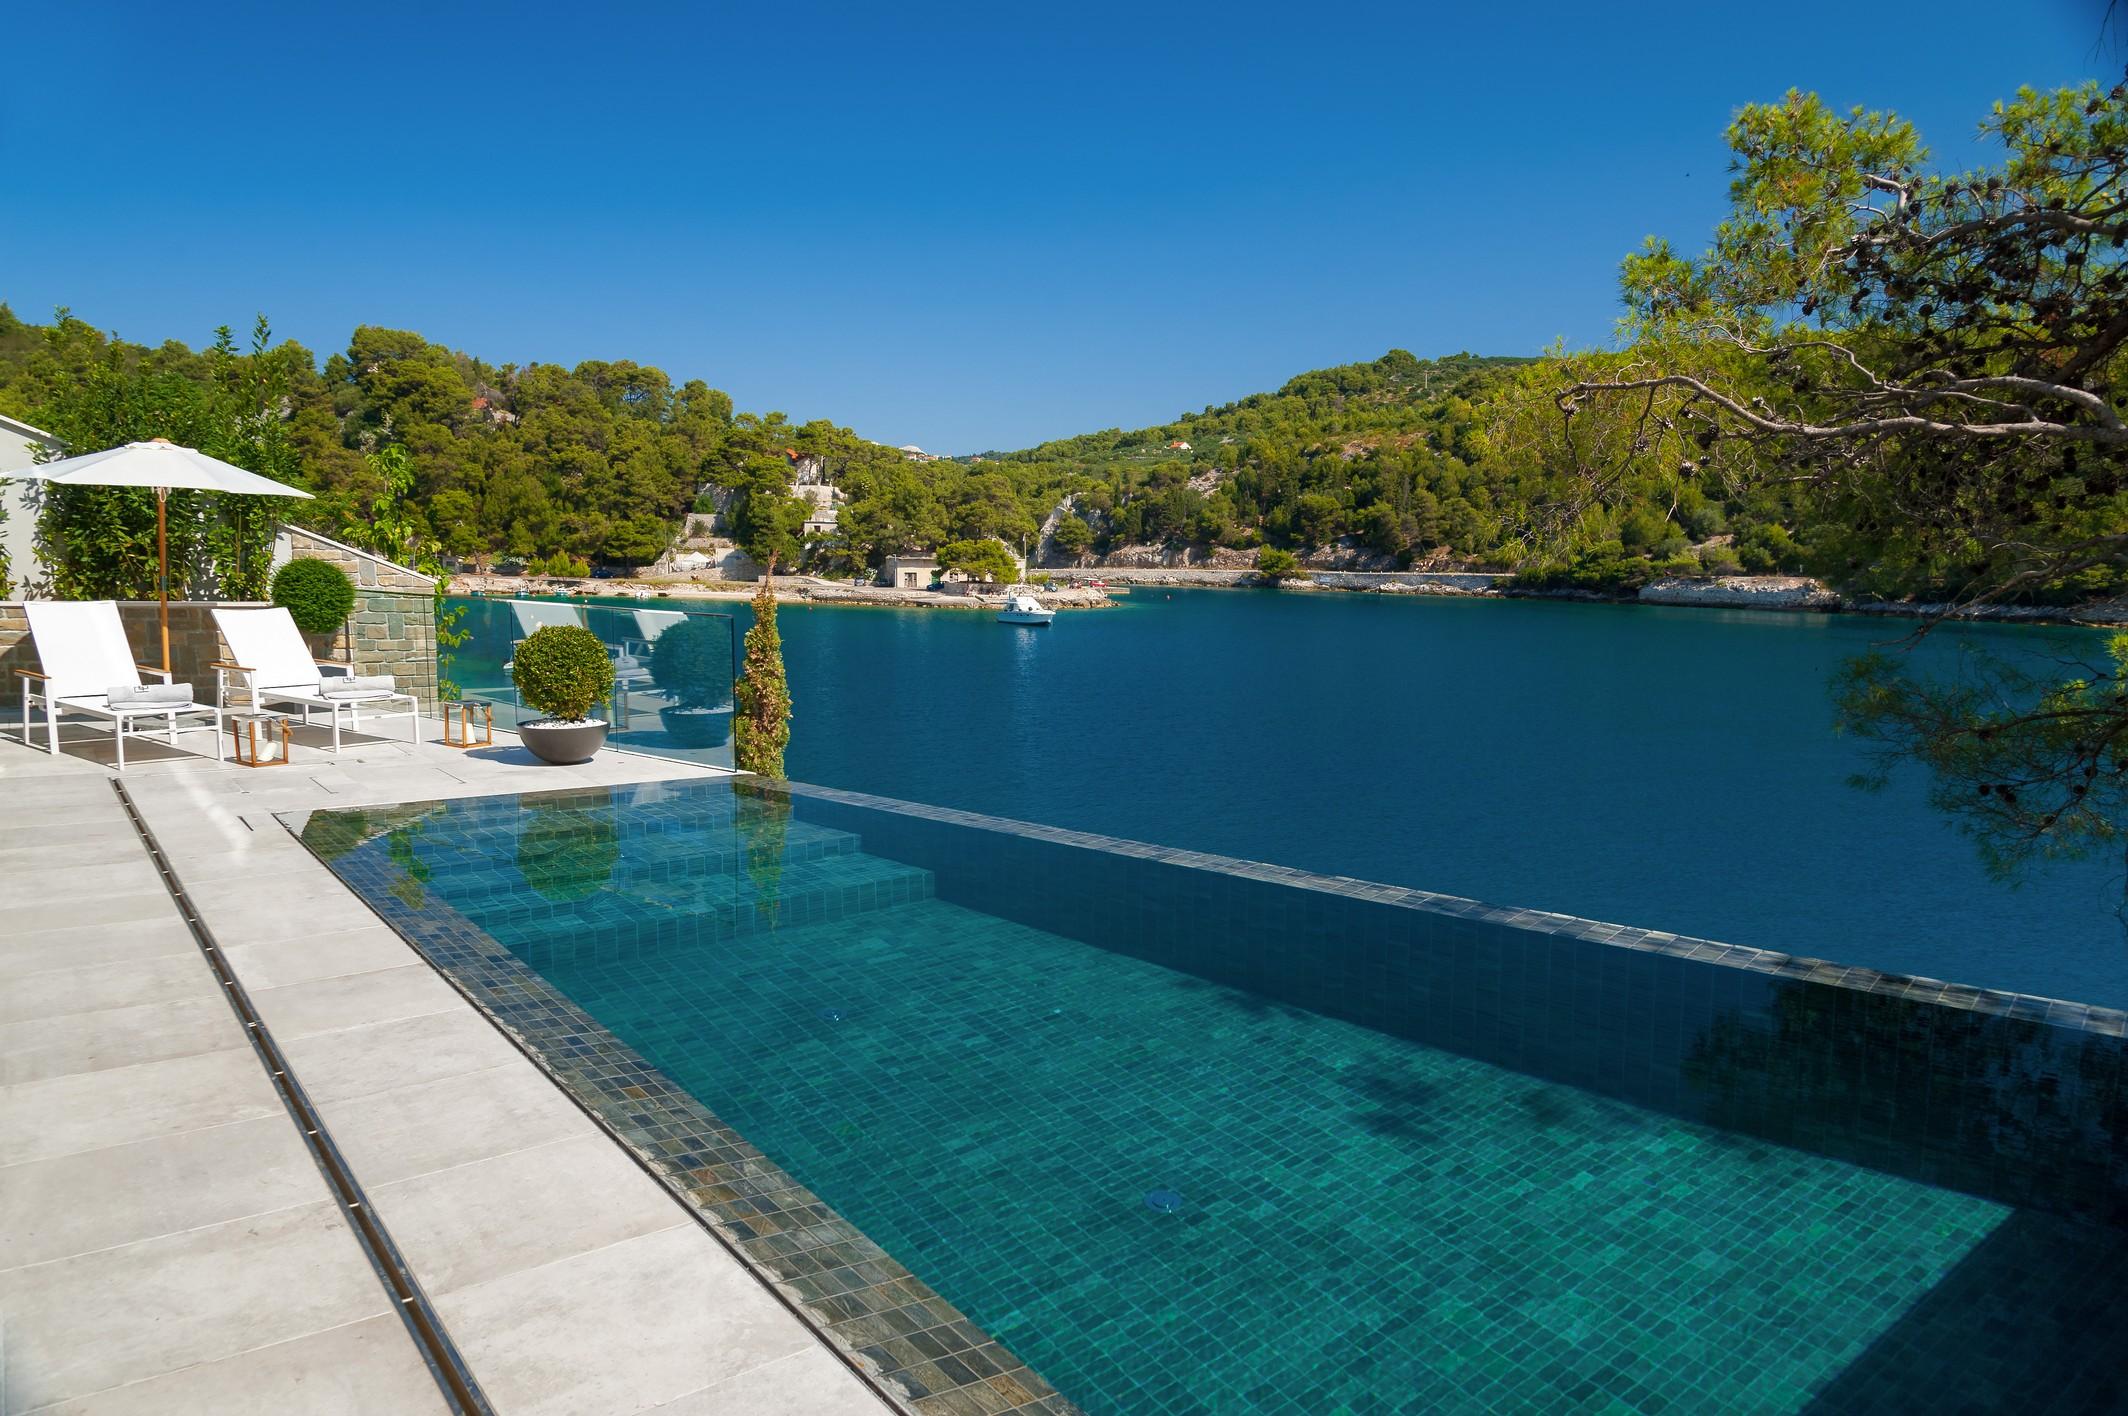 The pool of Luxury Villa Silent